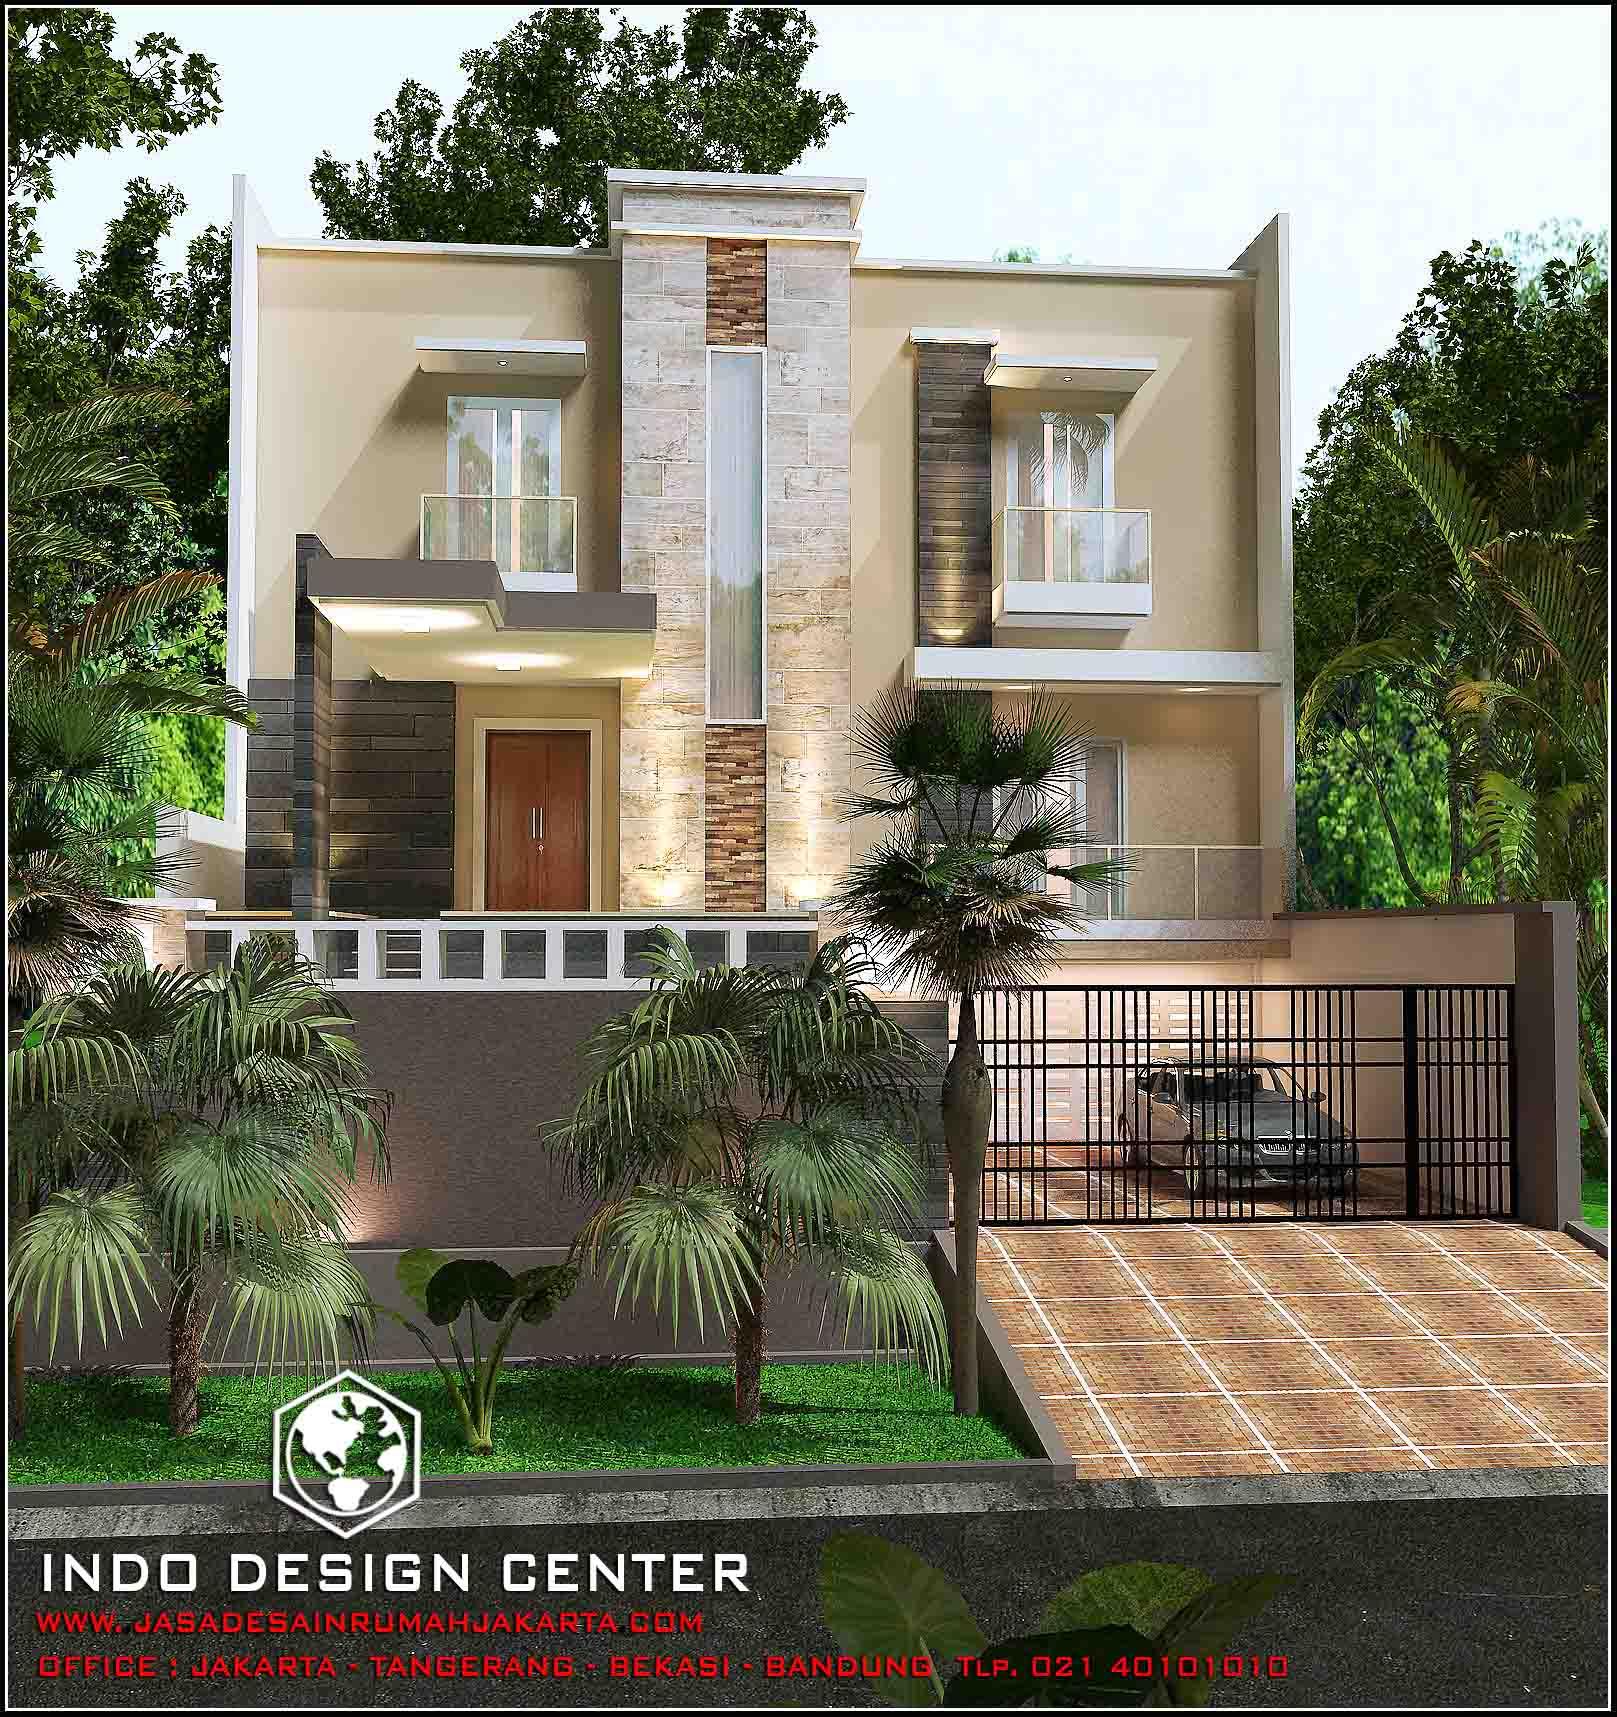 Desain Rumah Indonesia Desain Interior Rumah Raffi Ahmad